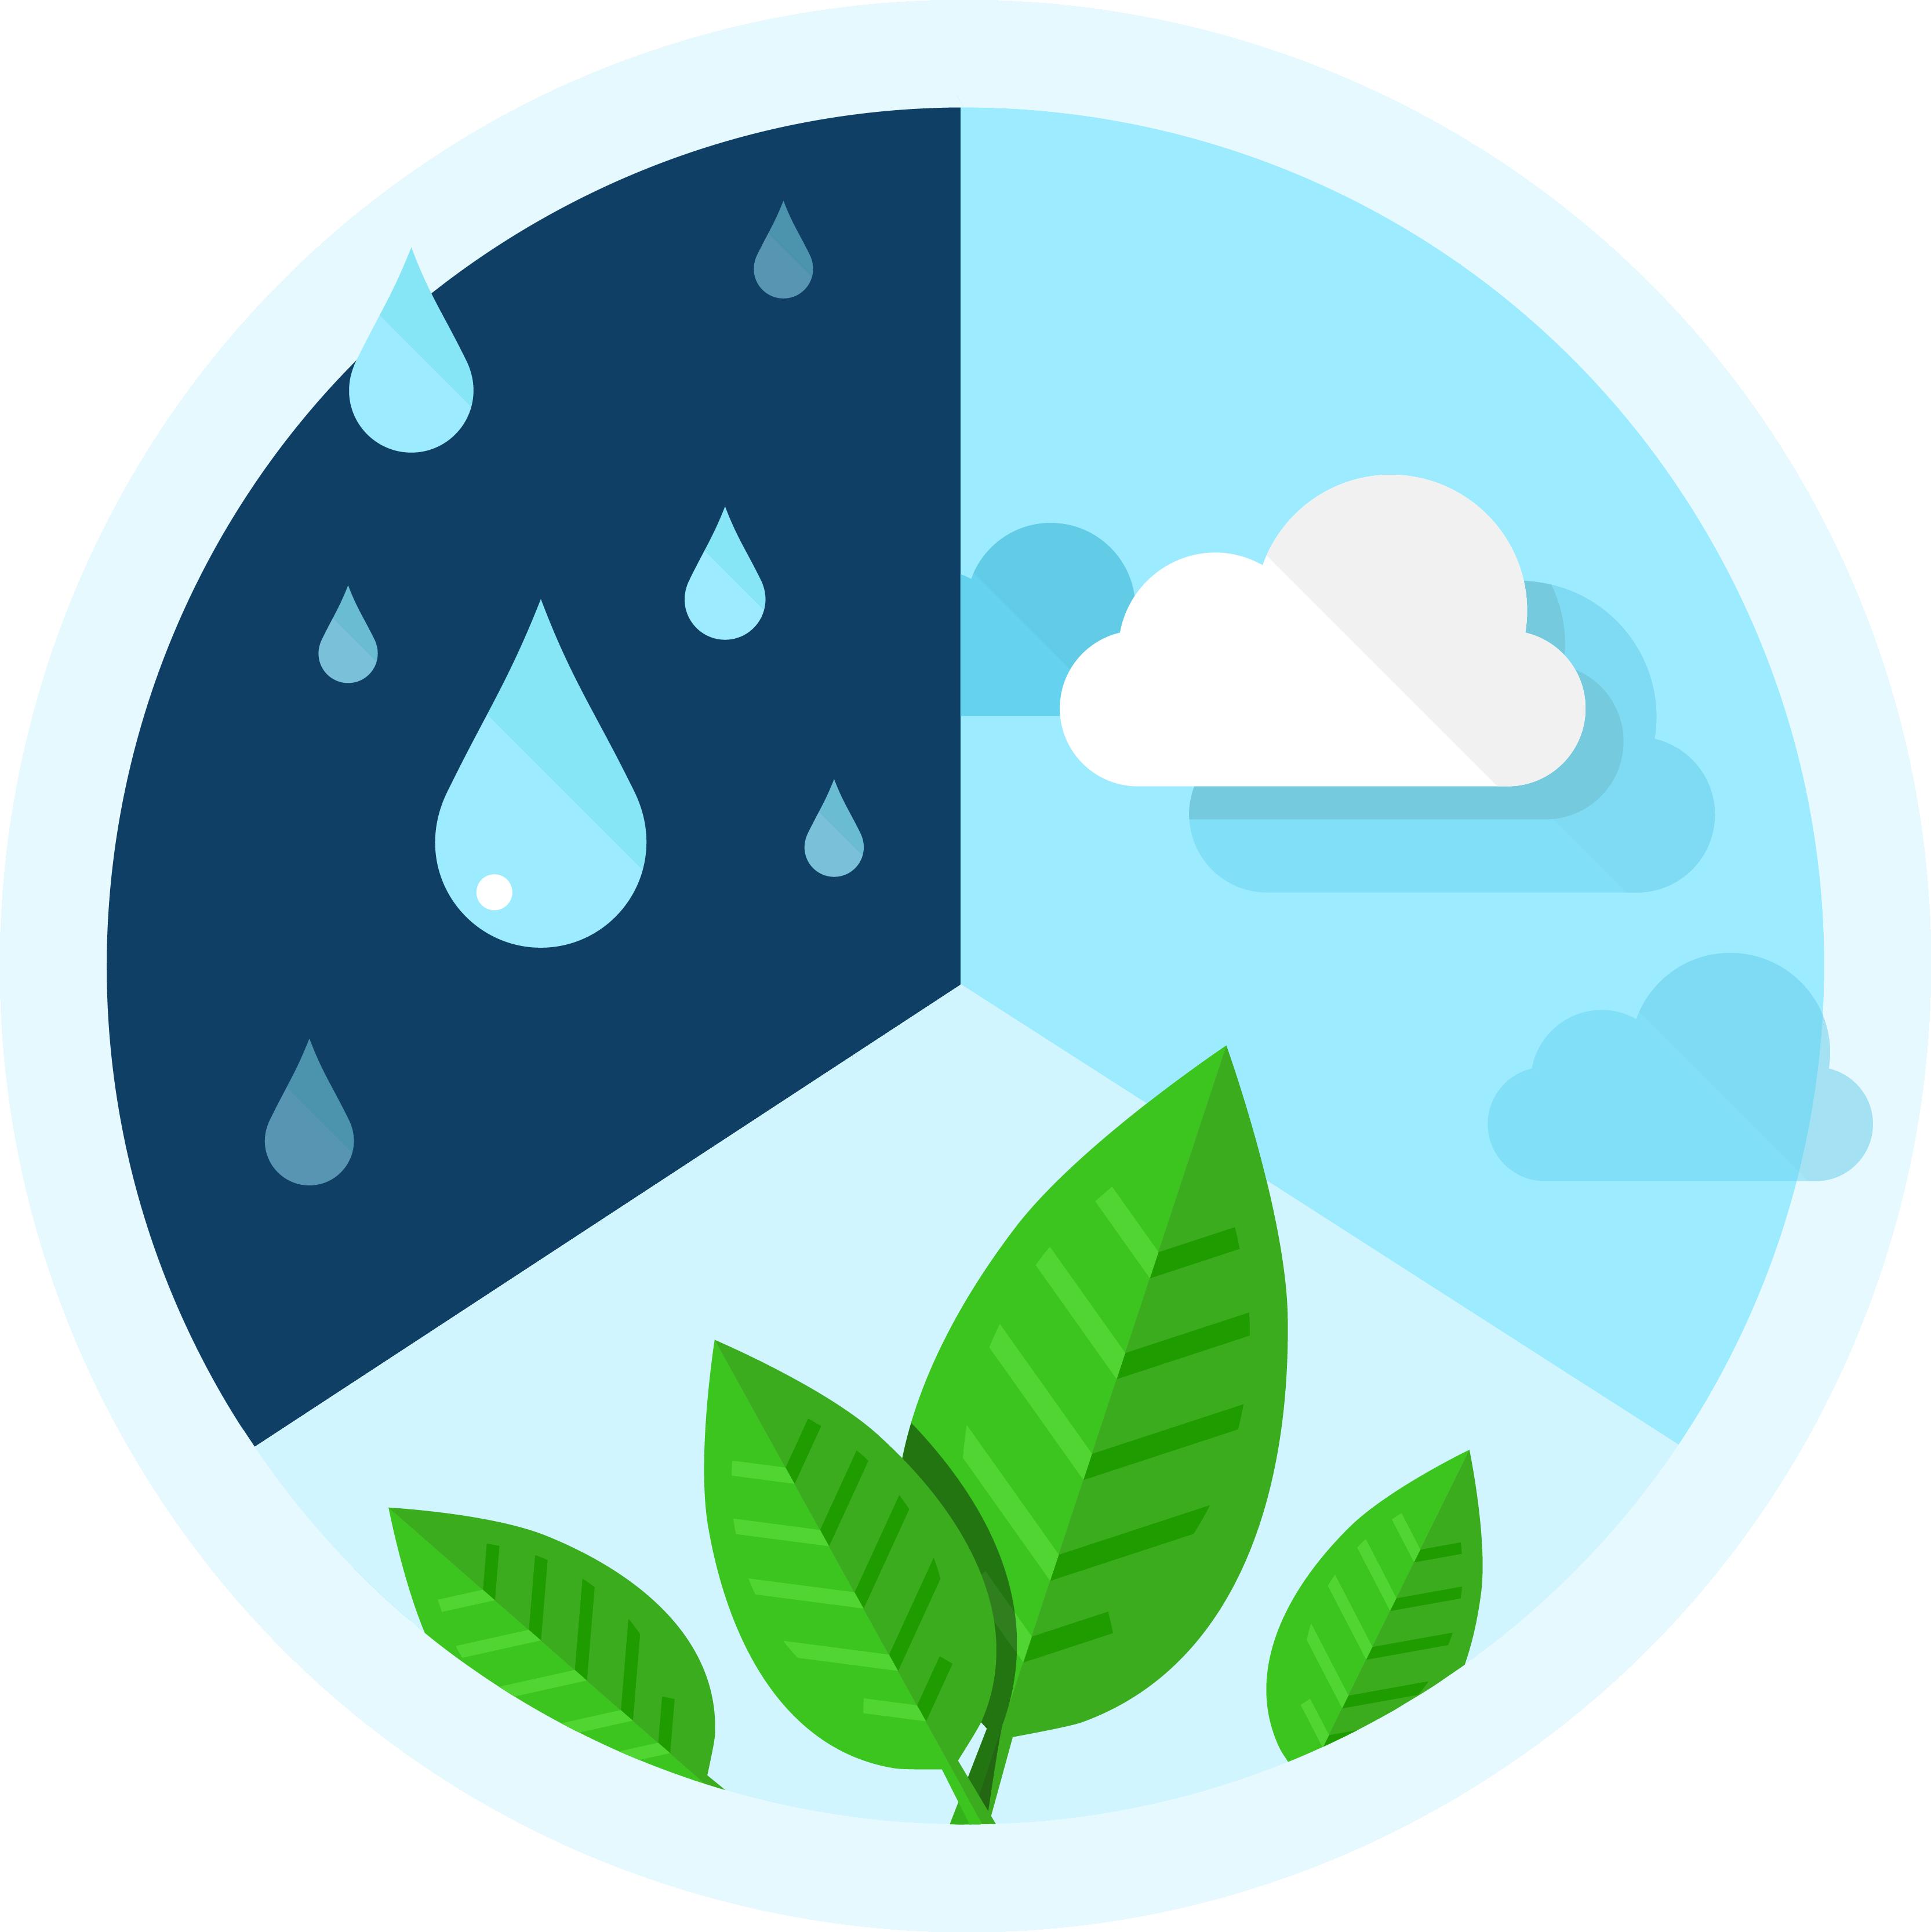 Assessment and monitoring bor. Environment clipart environmental impact